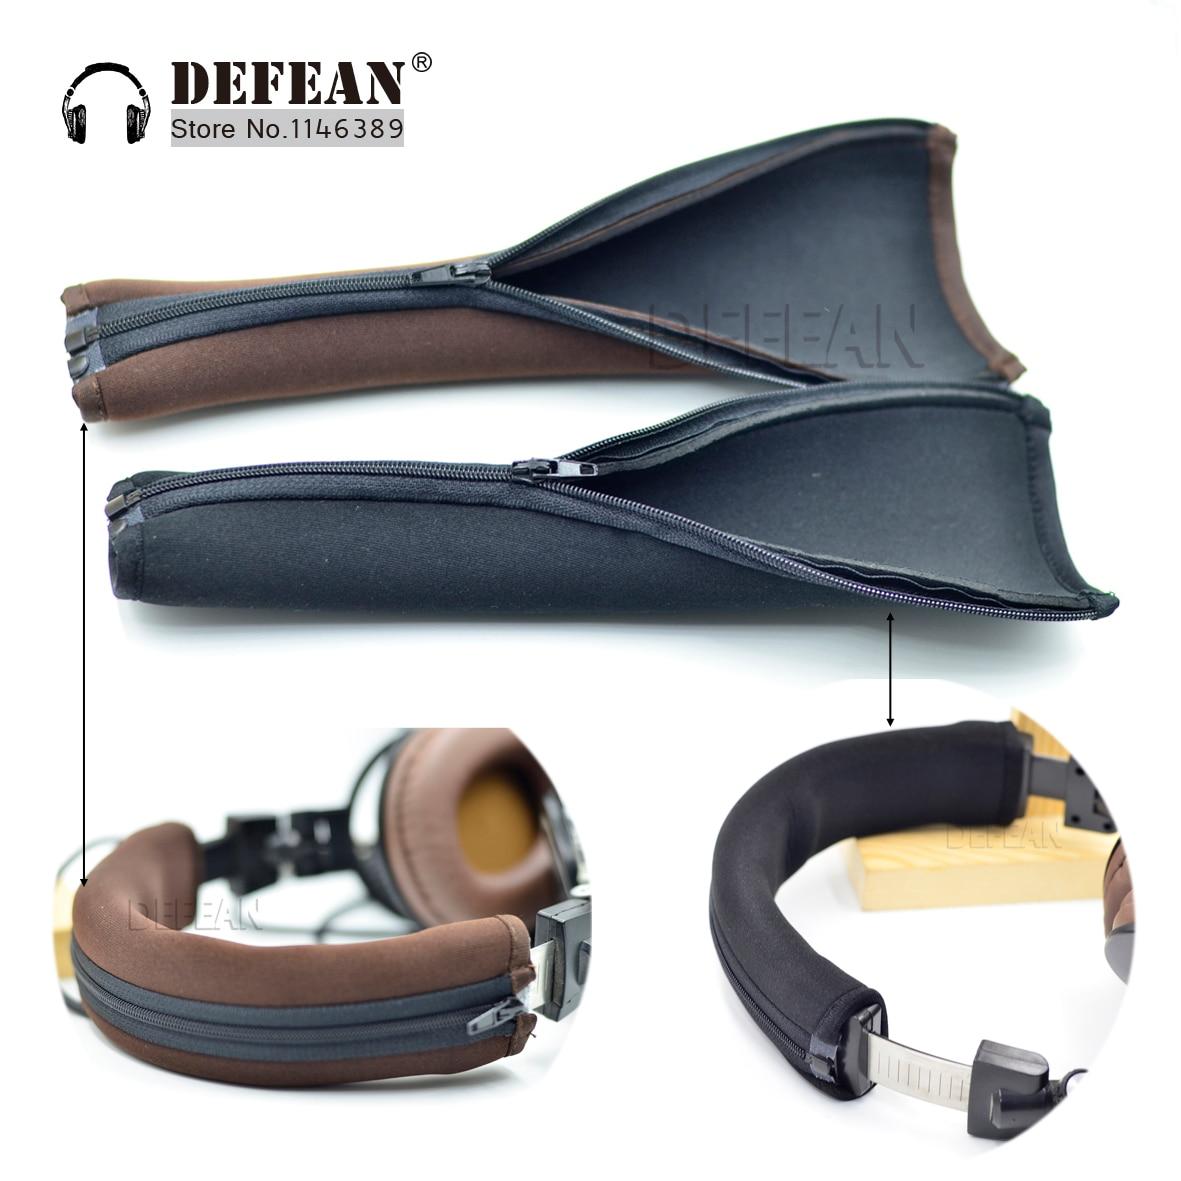 Pieza de reparación diadema gancho para cojín para Audio Technica ATH M50 M 50 DJ M50S M50X M40 M40S M40X M30 h Auriculares auriculares